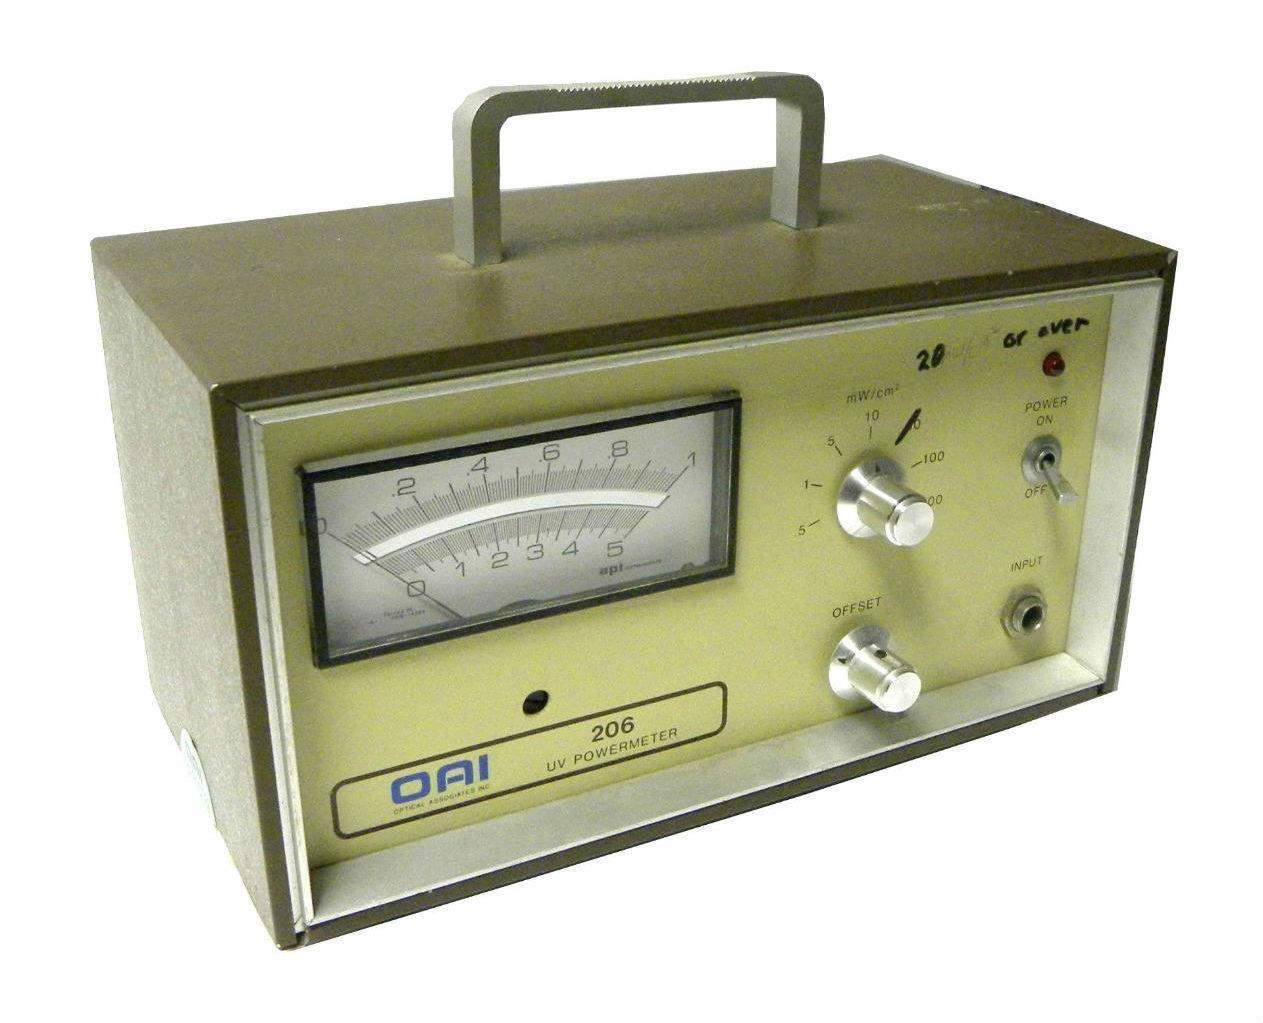 OPTICAL ASSOCIATES 206-C009-4-81 UV POWER METER